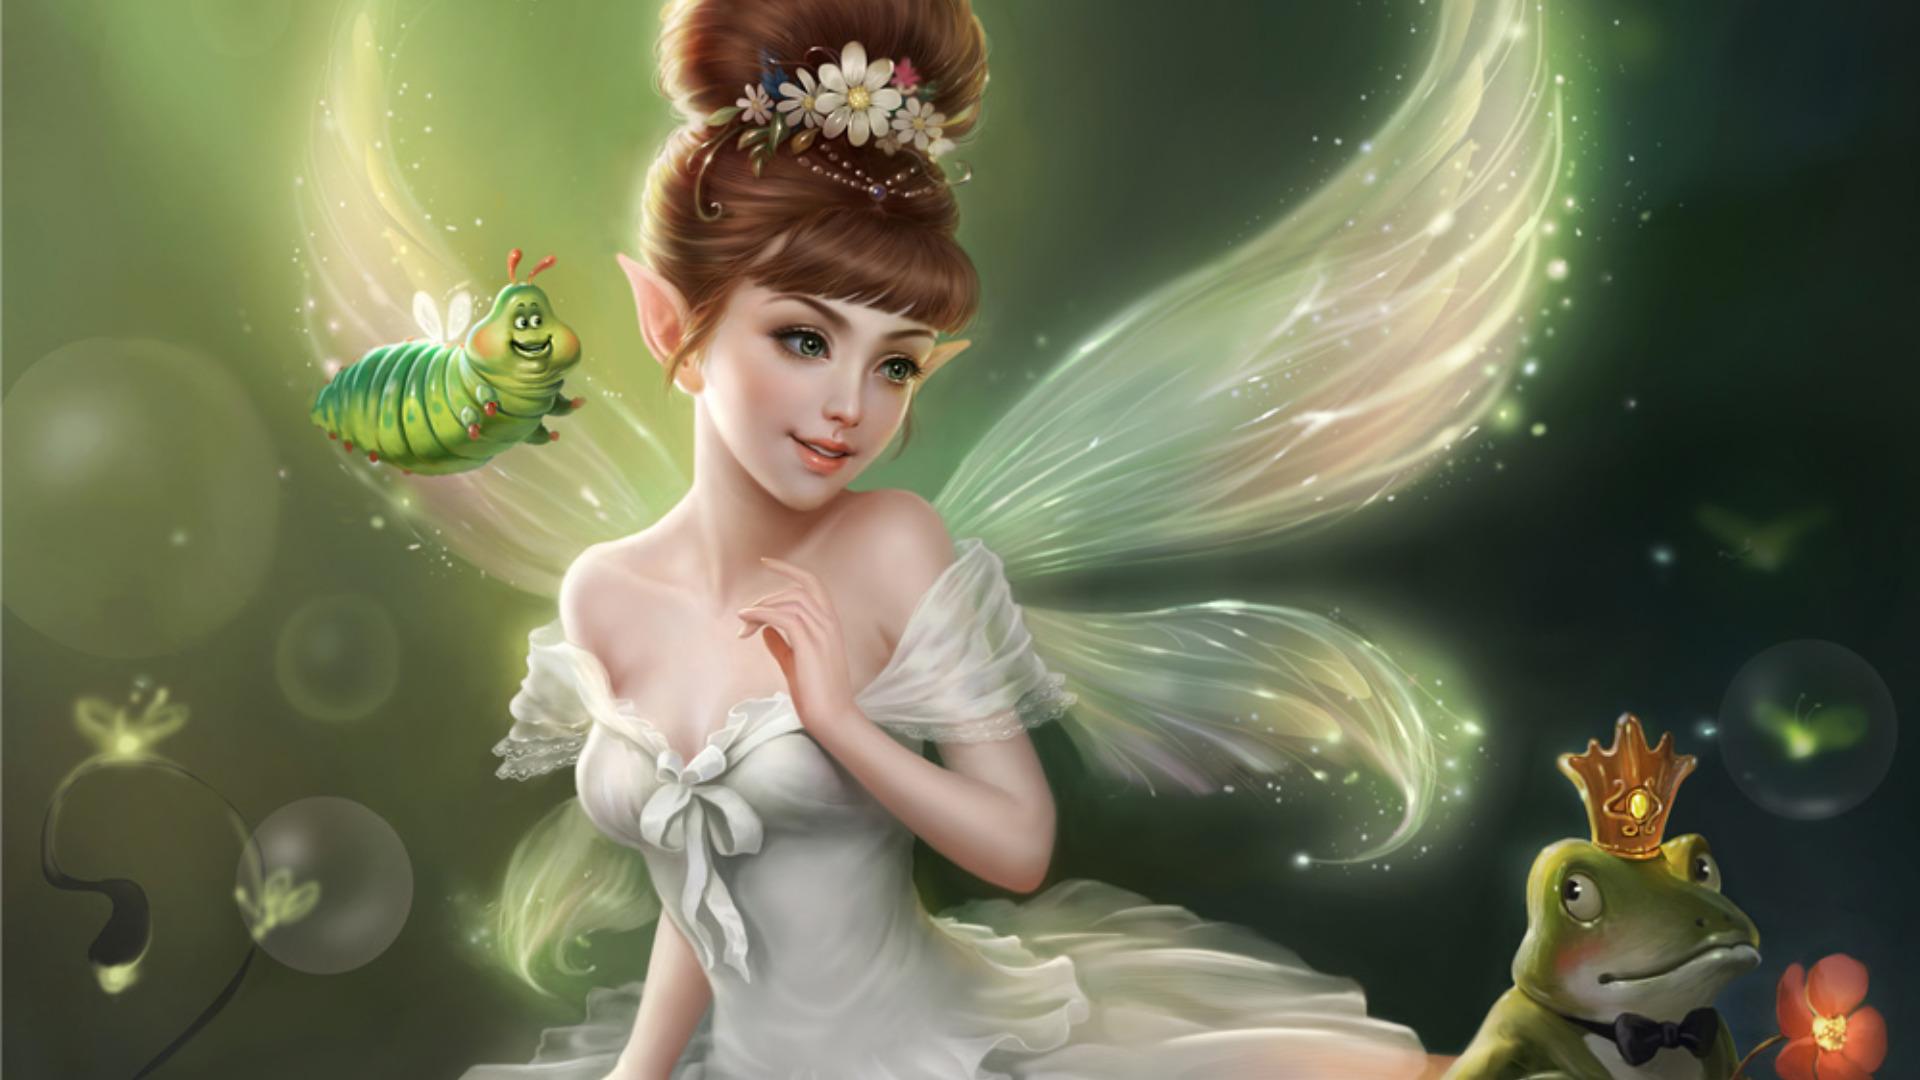 Wallpapers for Gt Cute Fairy Wallpaper Desktop Xpx